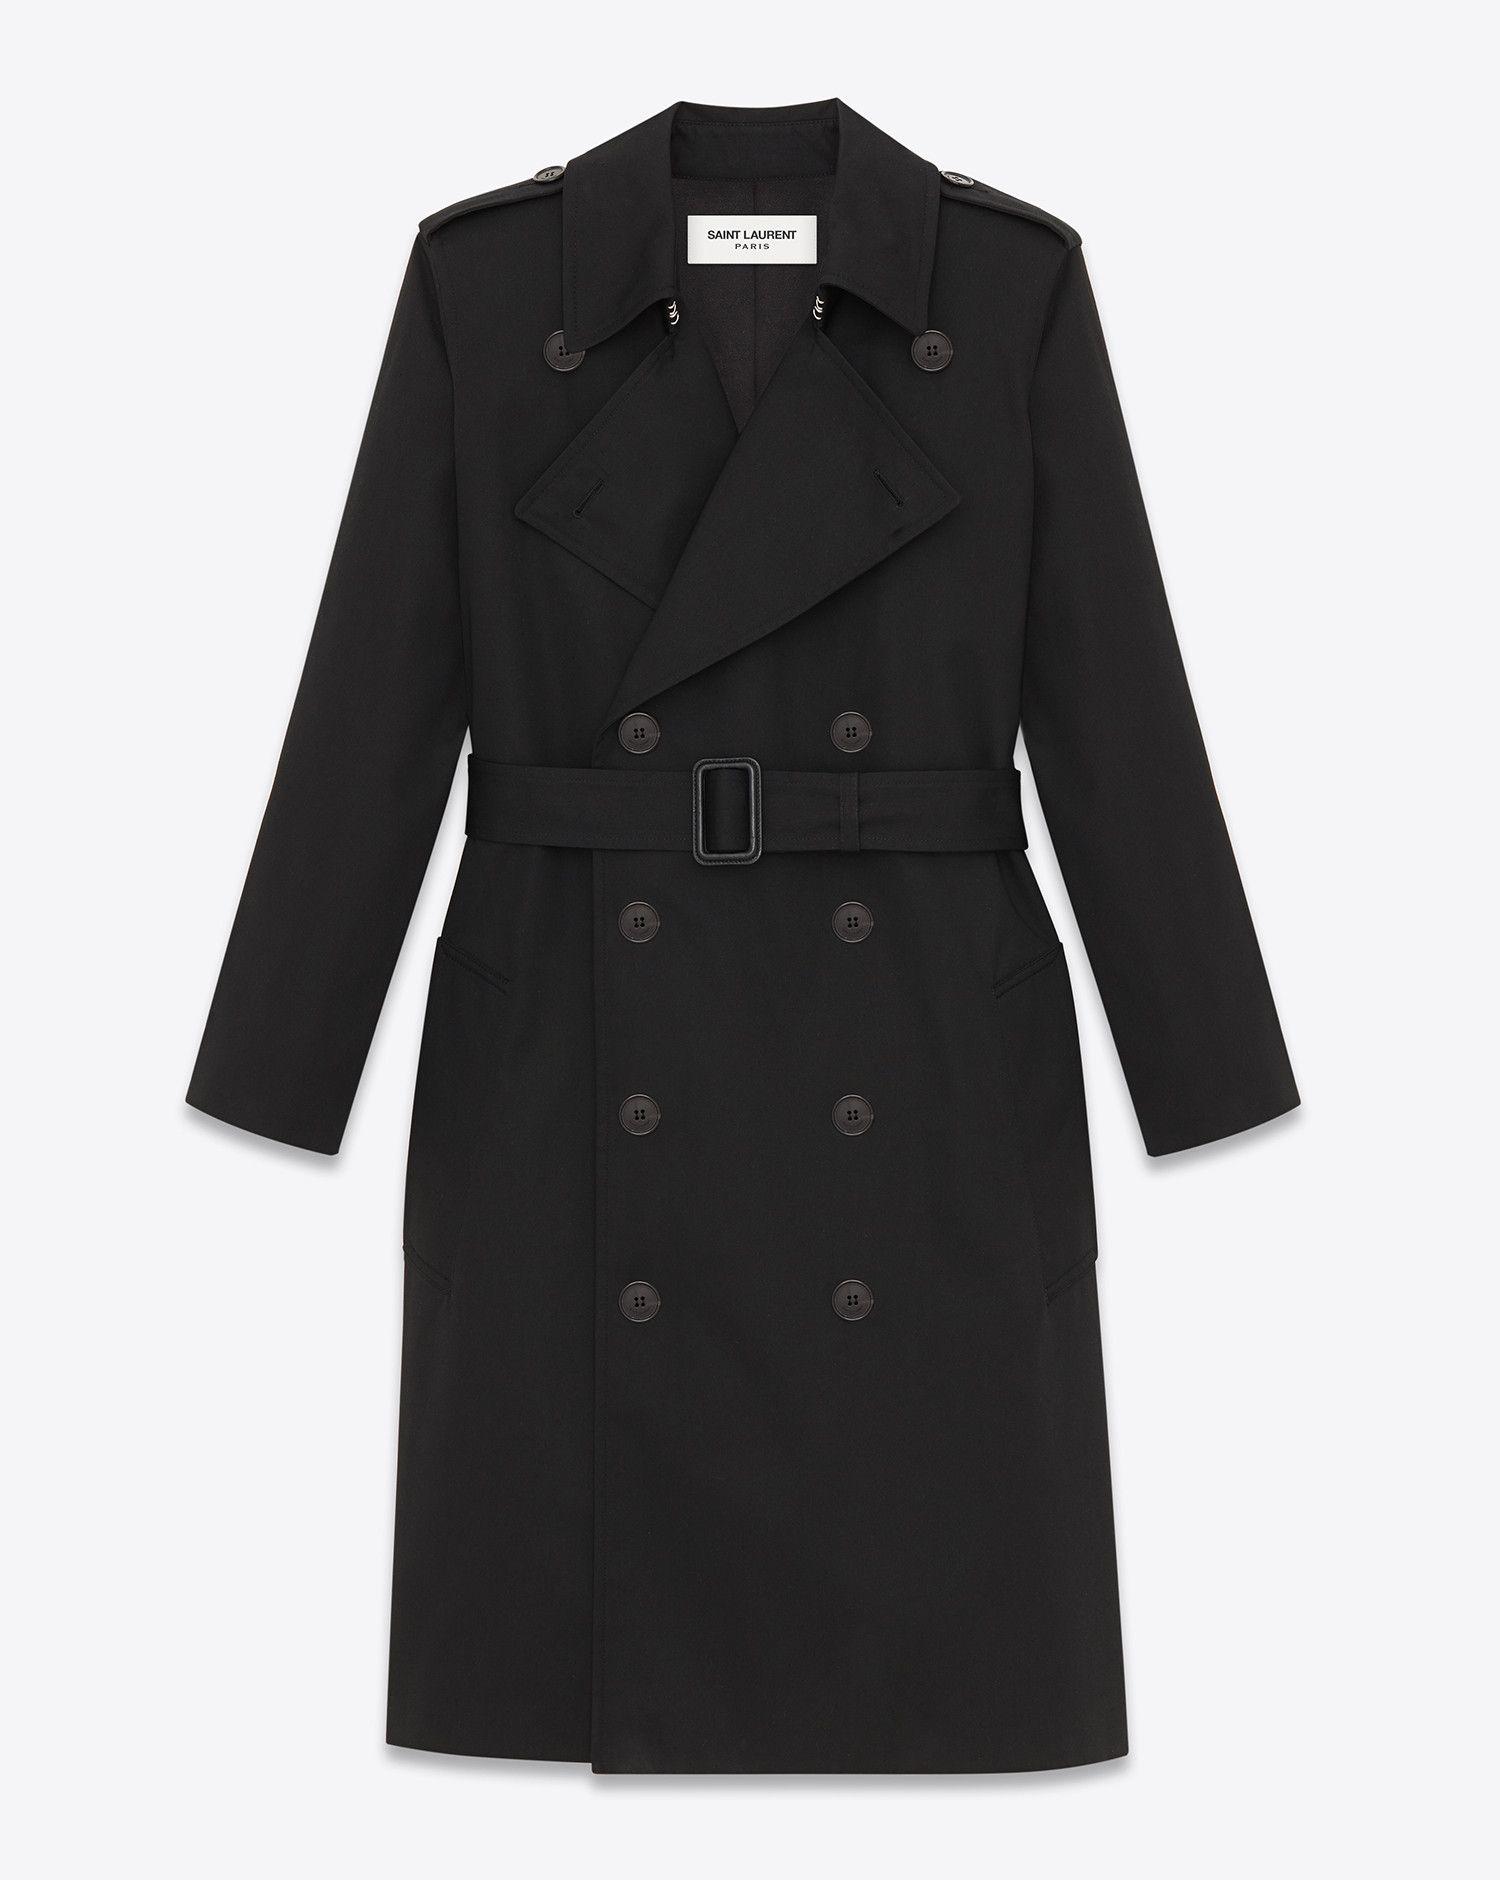 87514e97cf Saint Laurent CLASSIC TRENCH COAT IN BLACK TECHNICAL GABARDINE   ysl ...